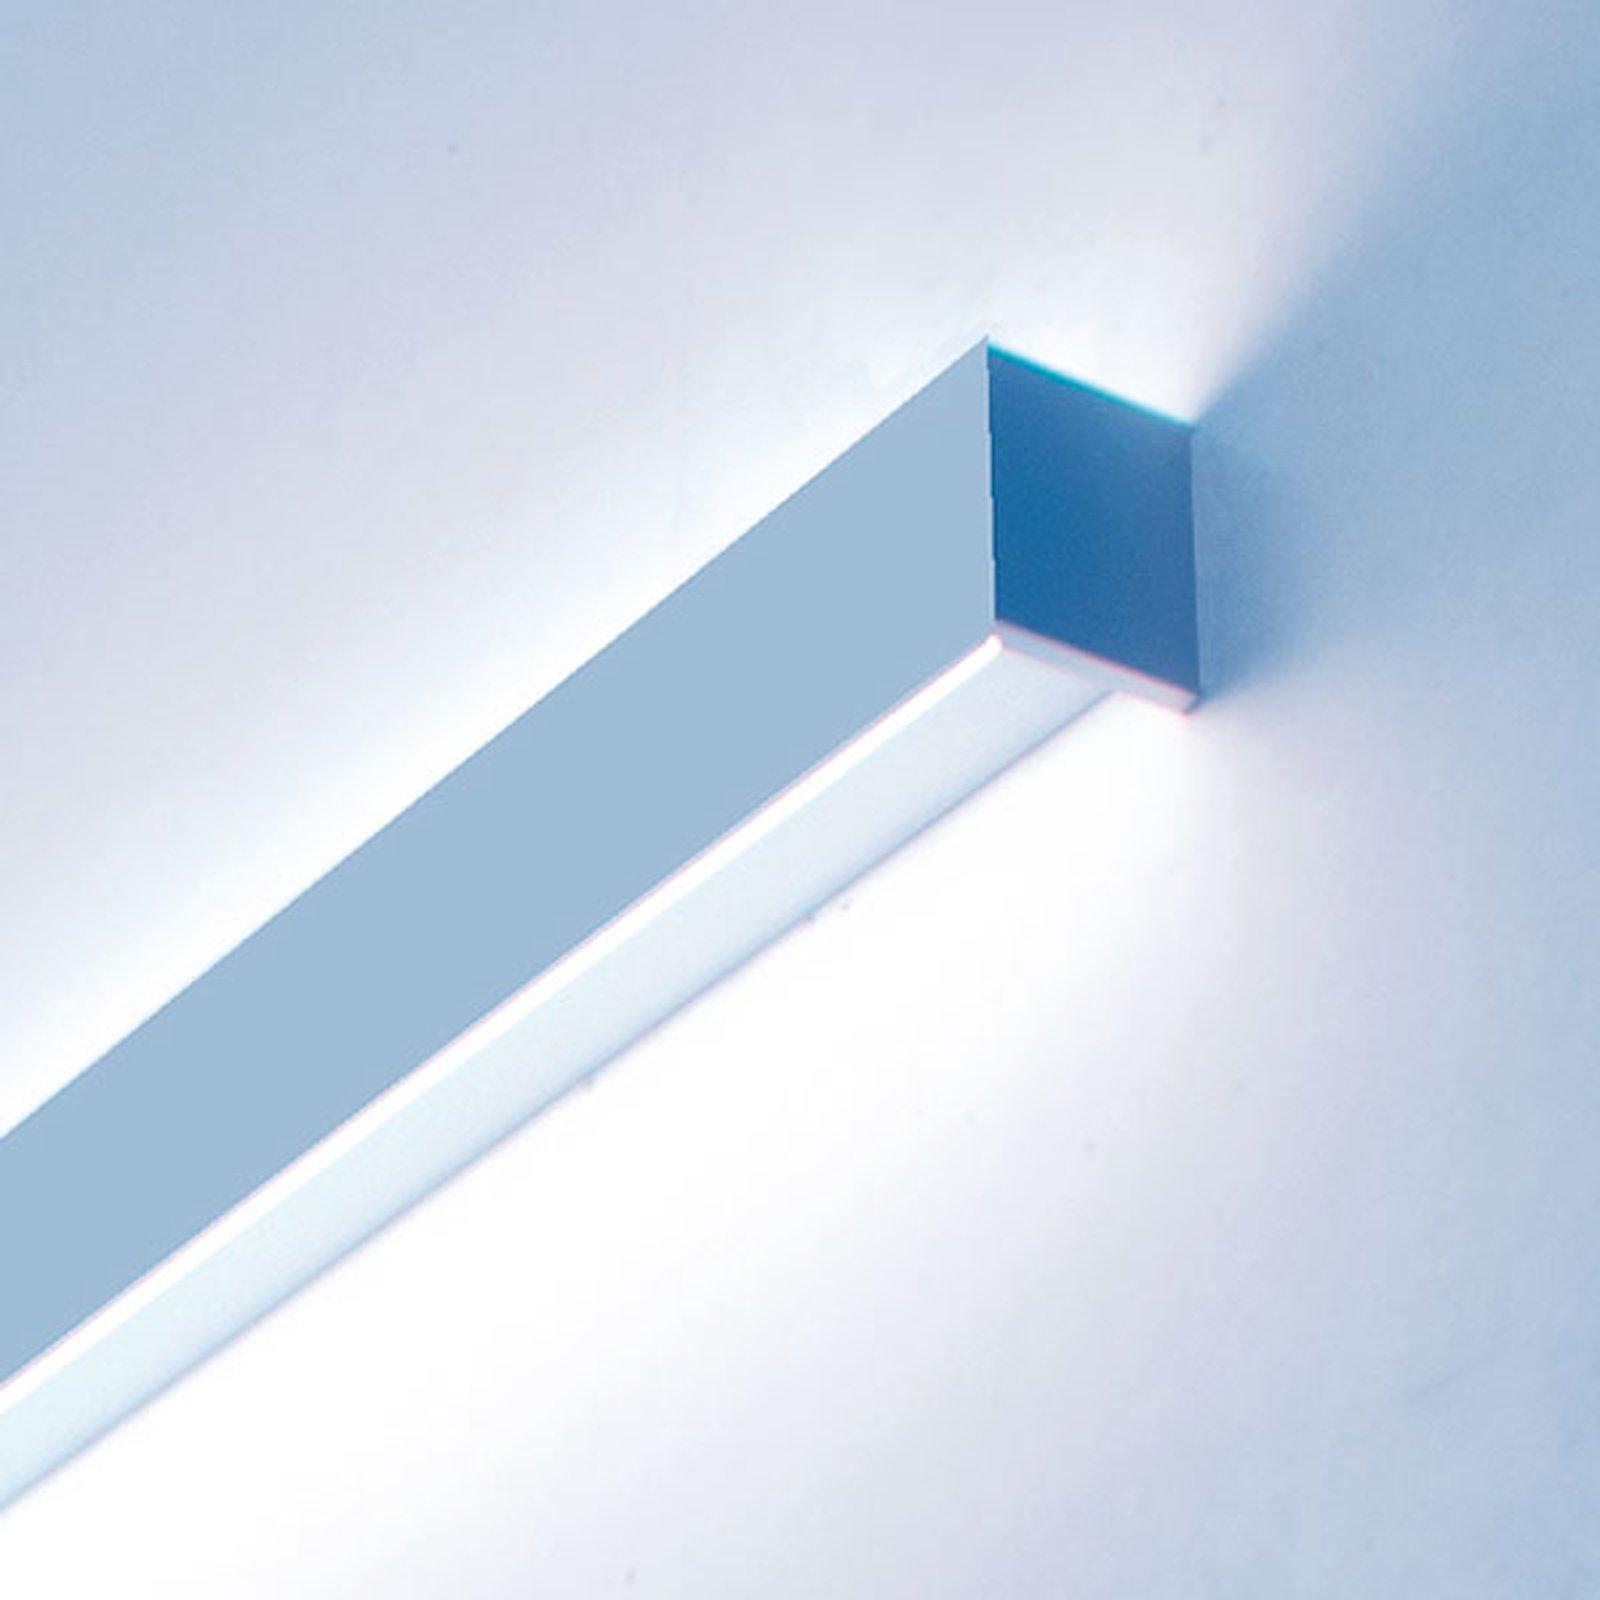 Matric W1 LED-vegglampe i 177 cm, 3 000 K